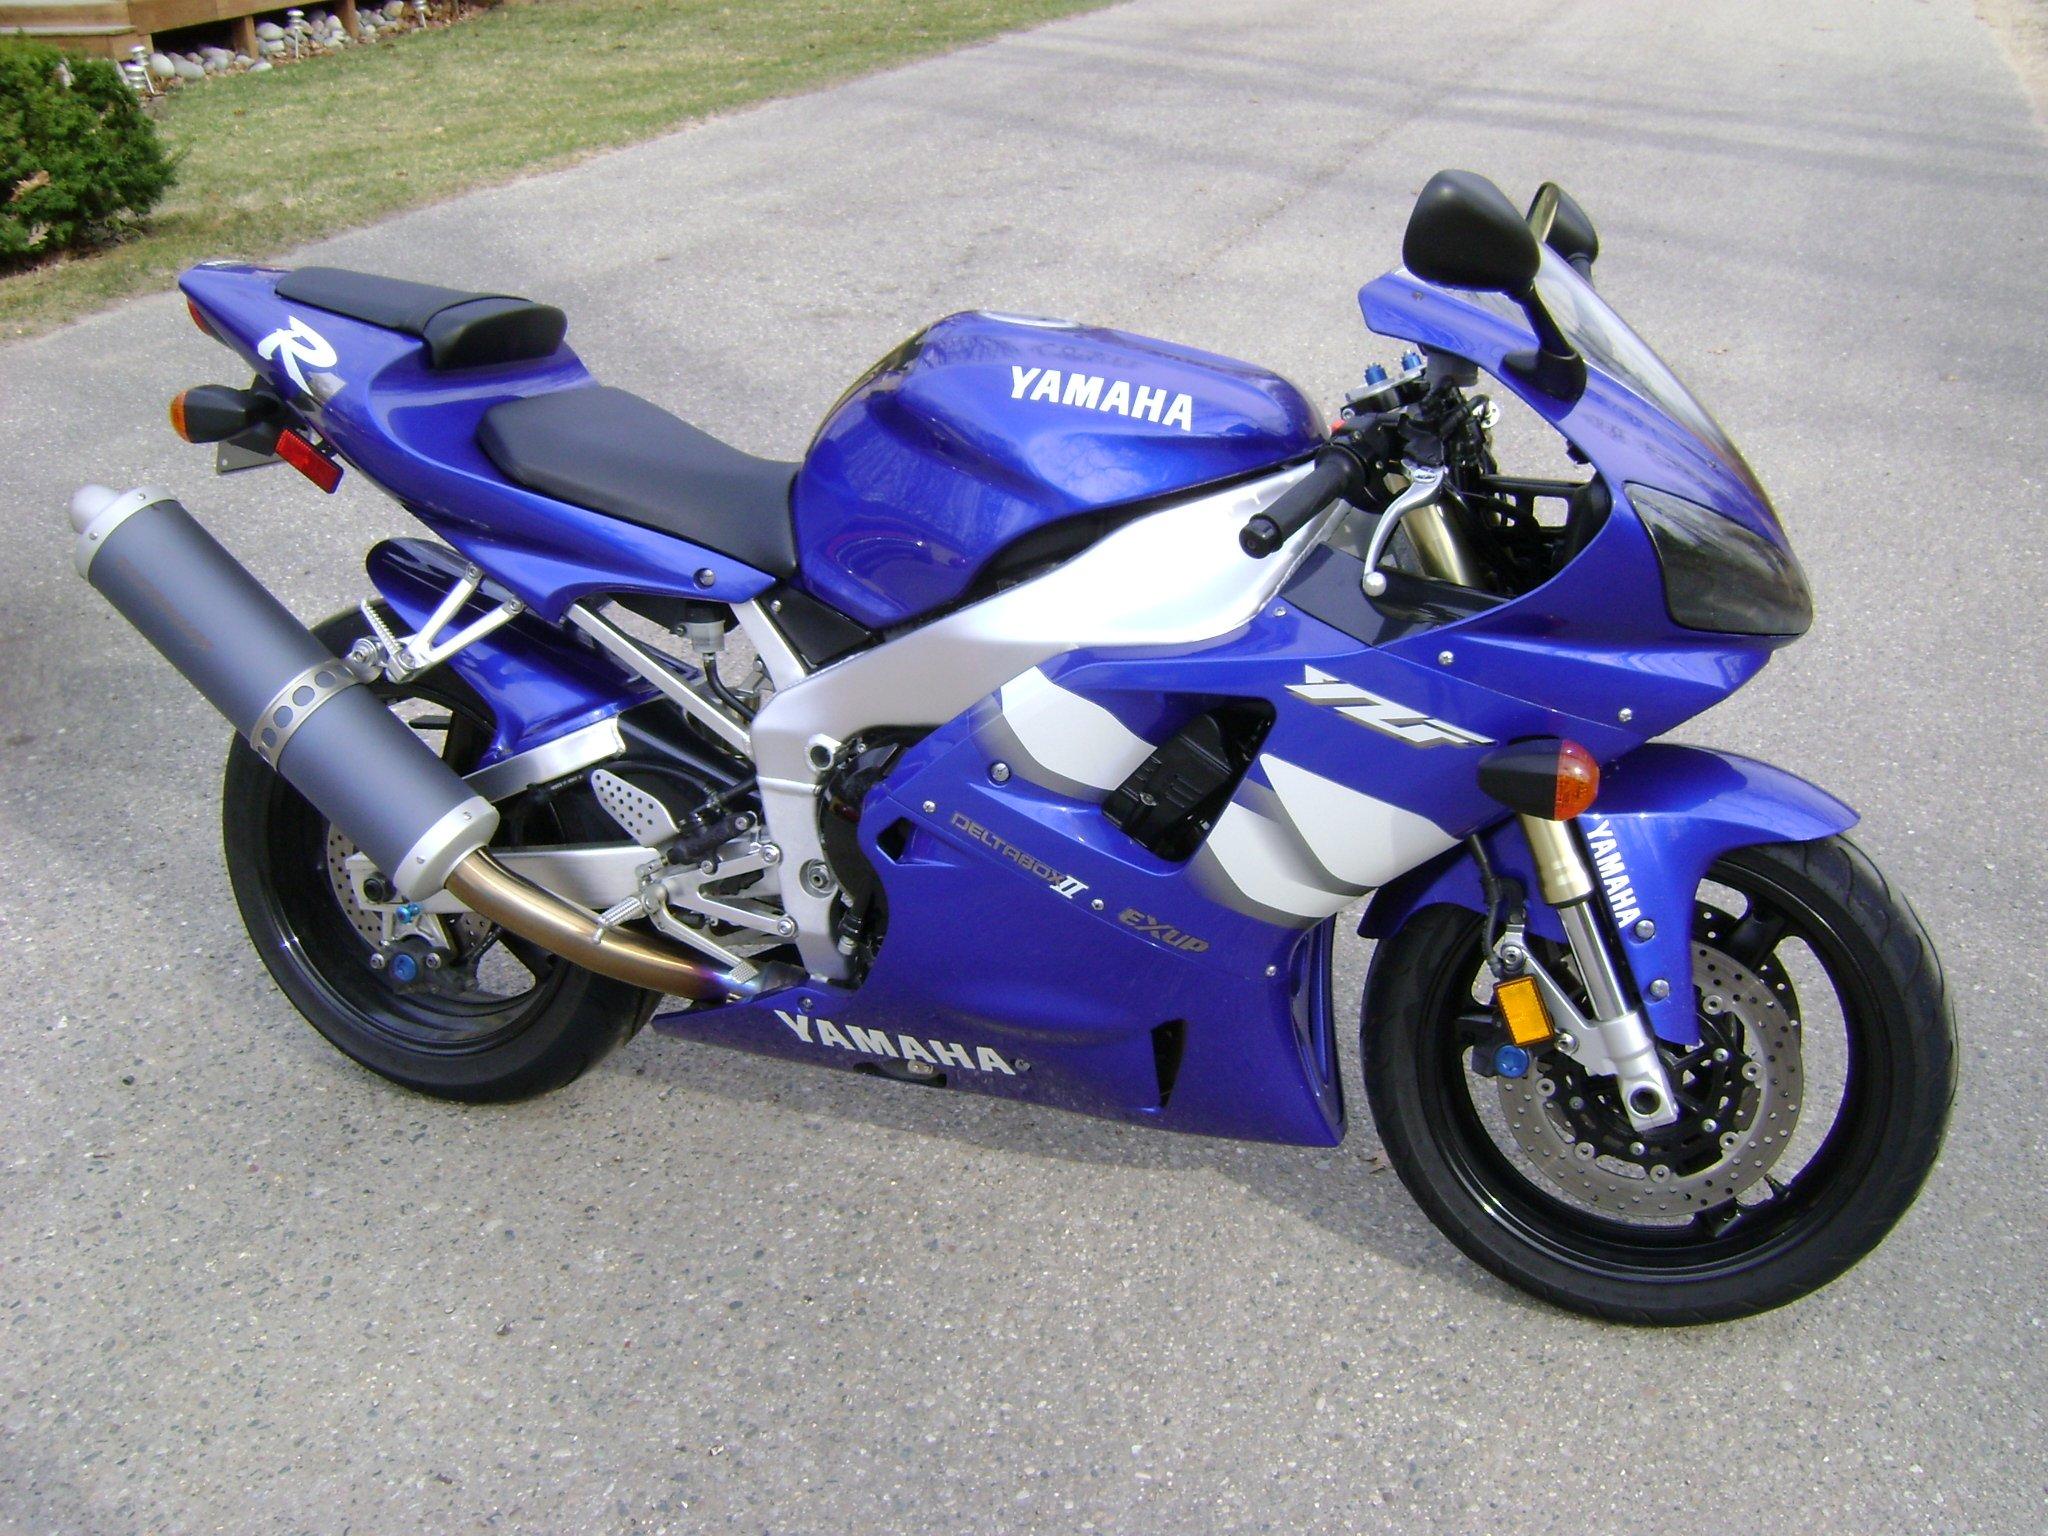 Top 12 Ebay Motorcycles Yamaha - Gorgeous Tiny